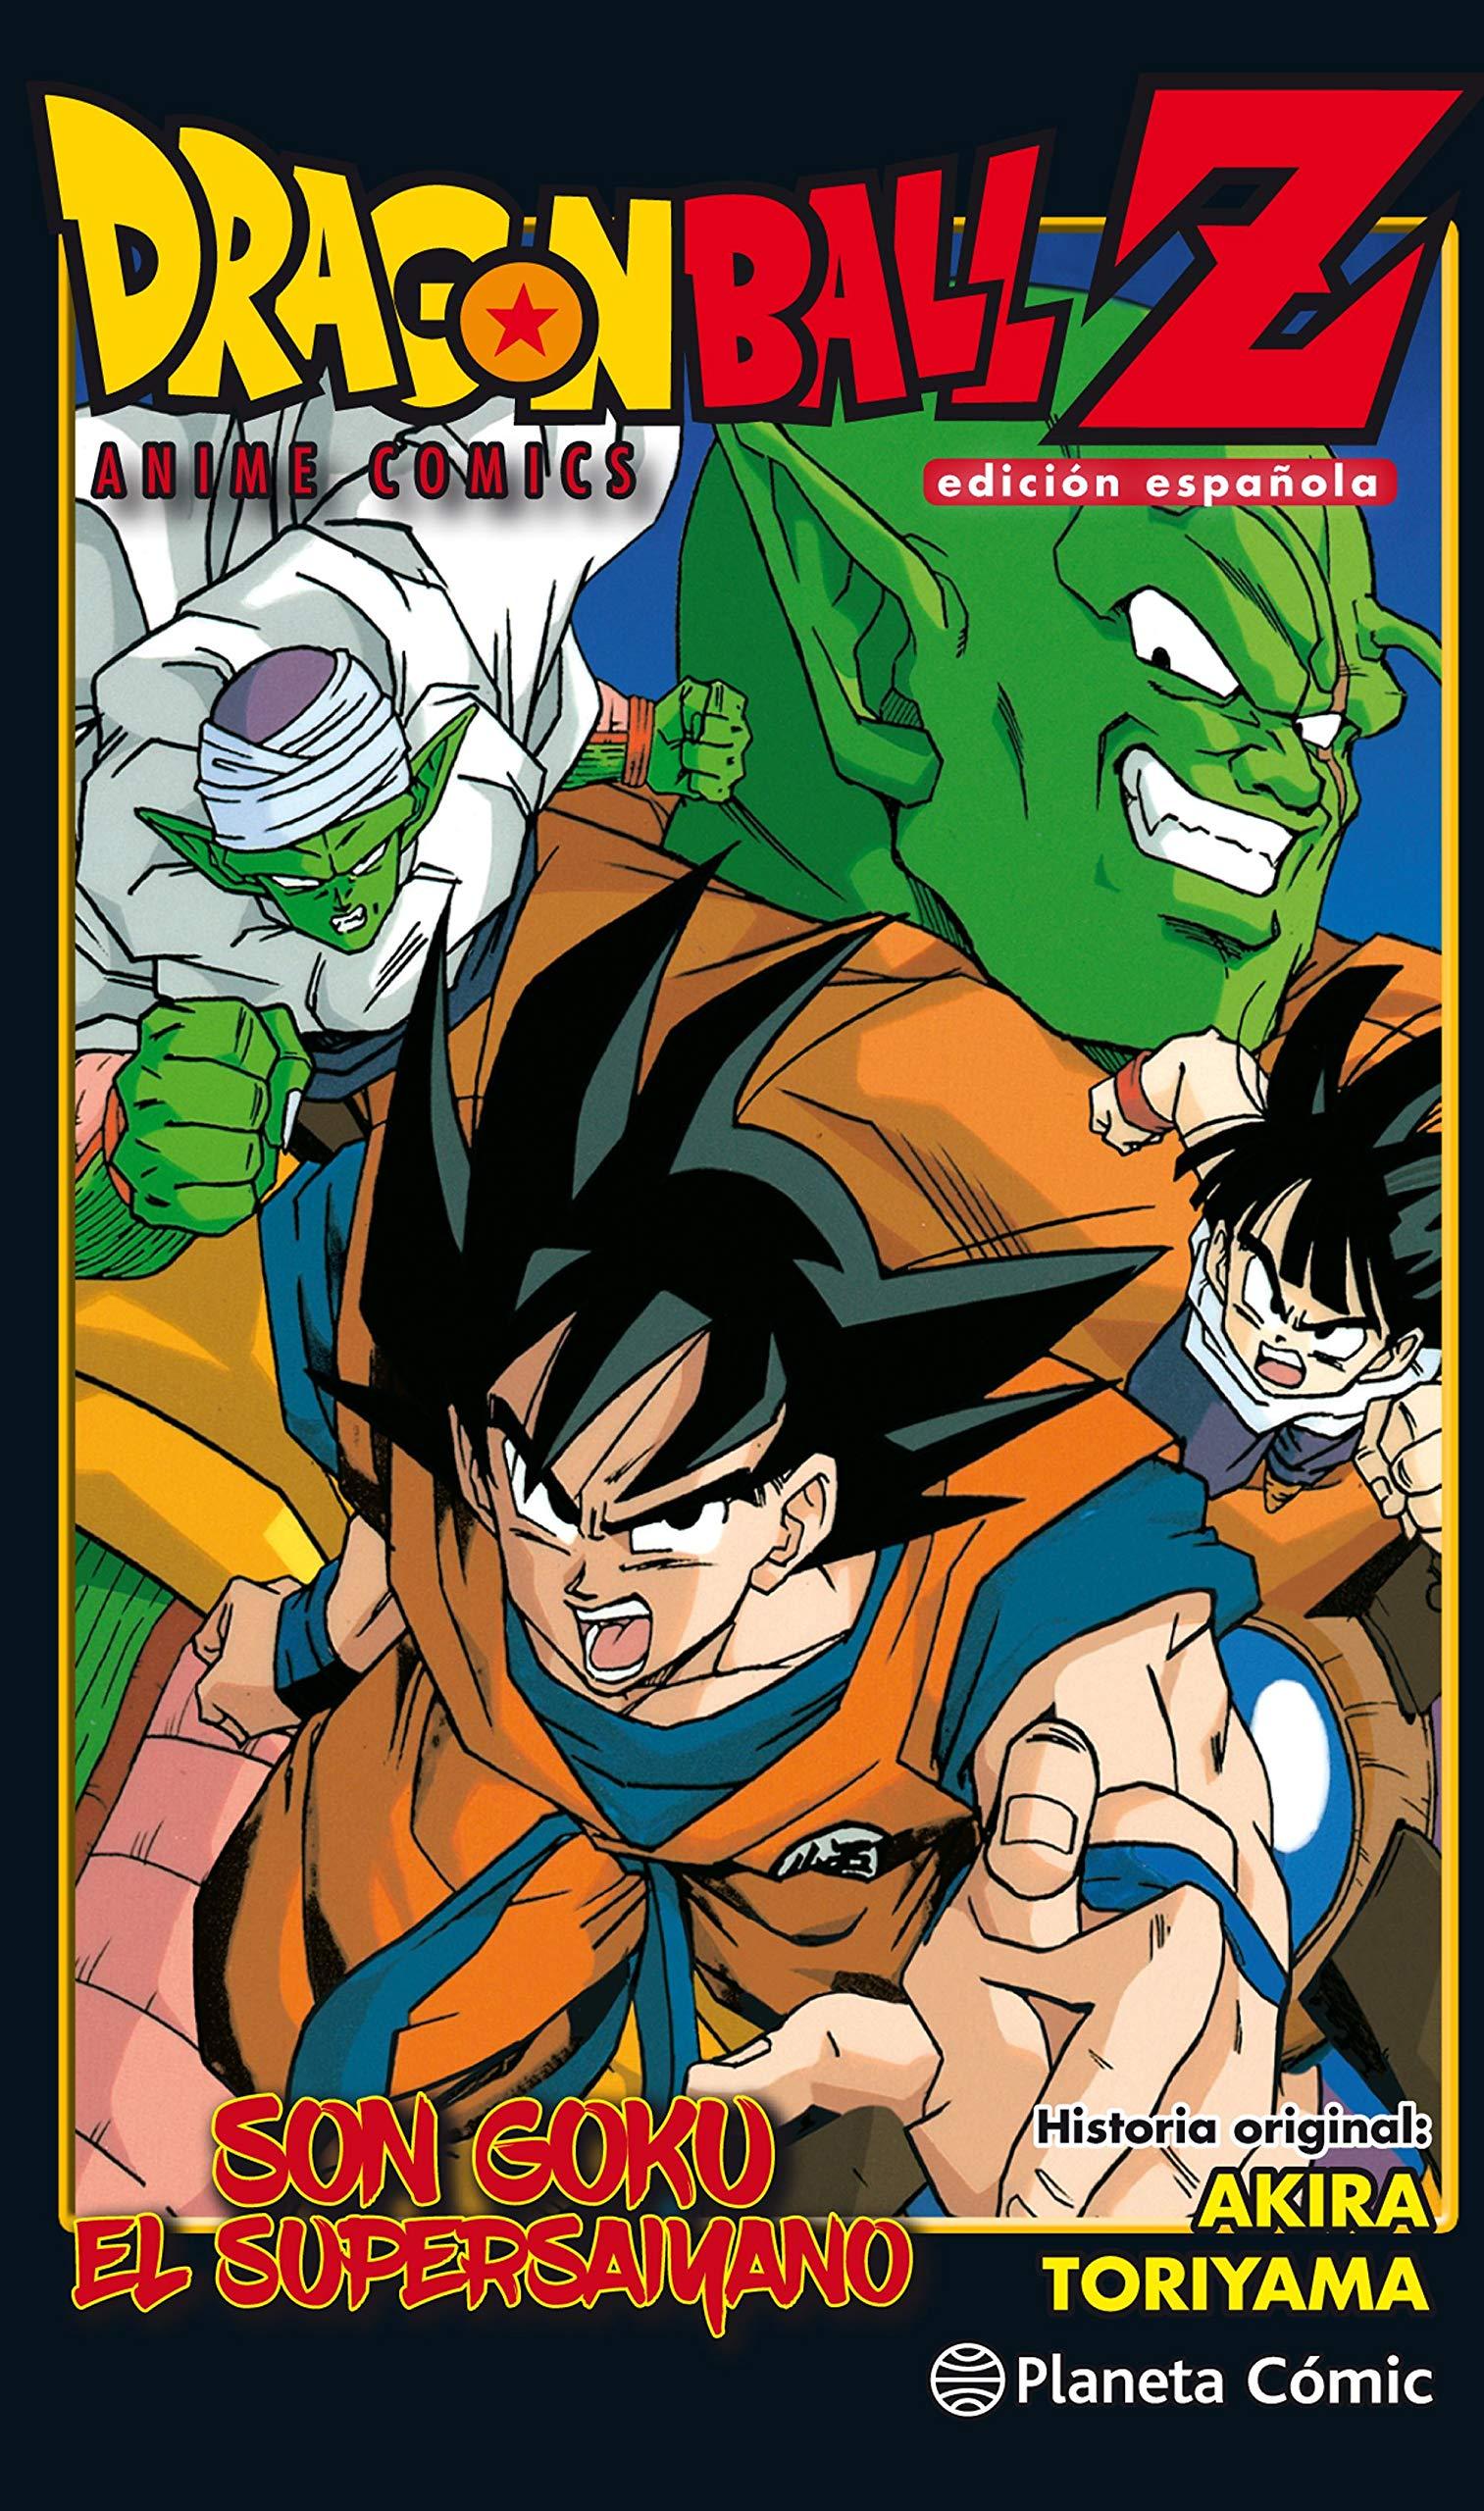 Dragon Ball Z Son Goku el Supersaiyano (Manga Shonen): Amazon.es: Toriyama, Akira, Daruma: Libros